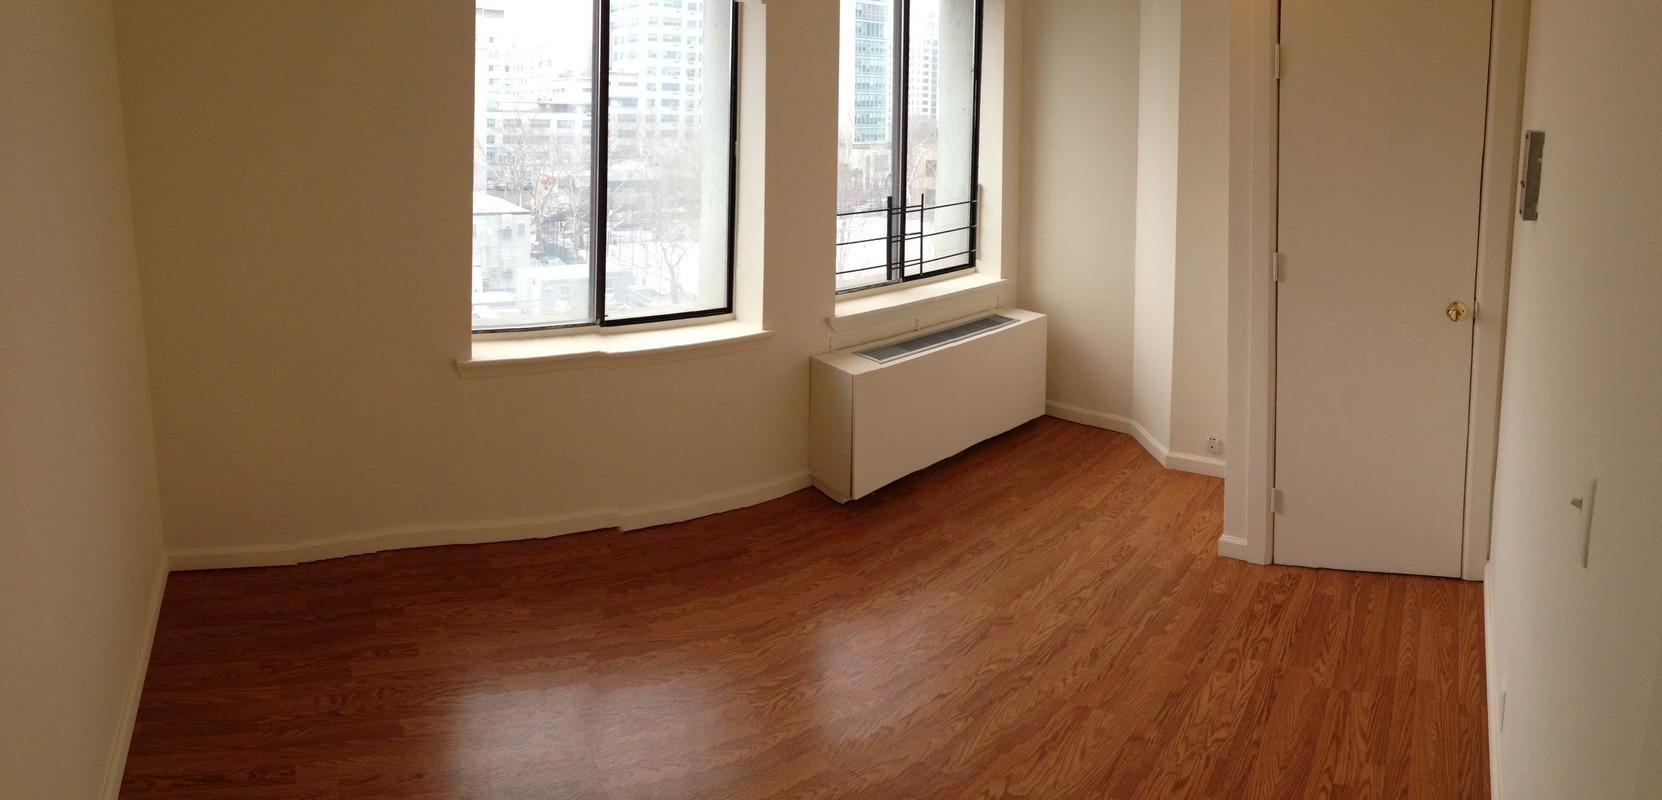 300 East 96th Street